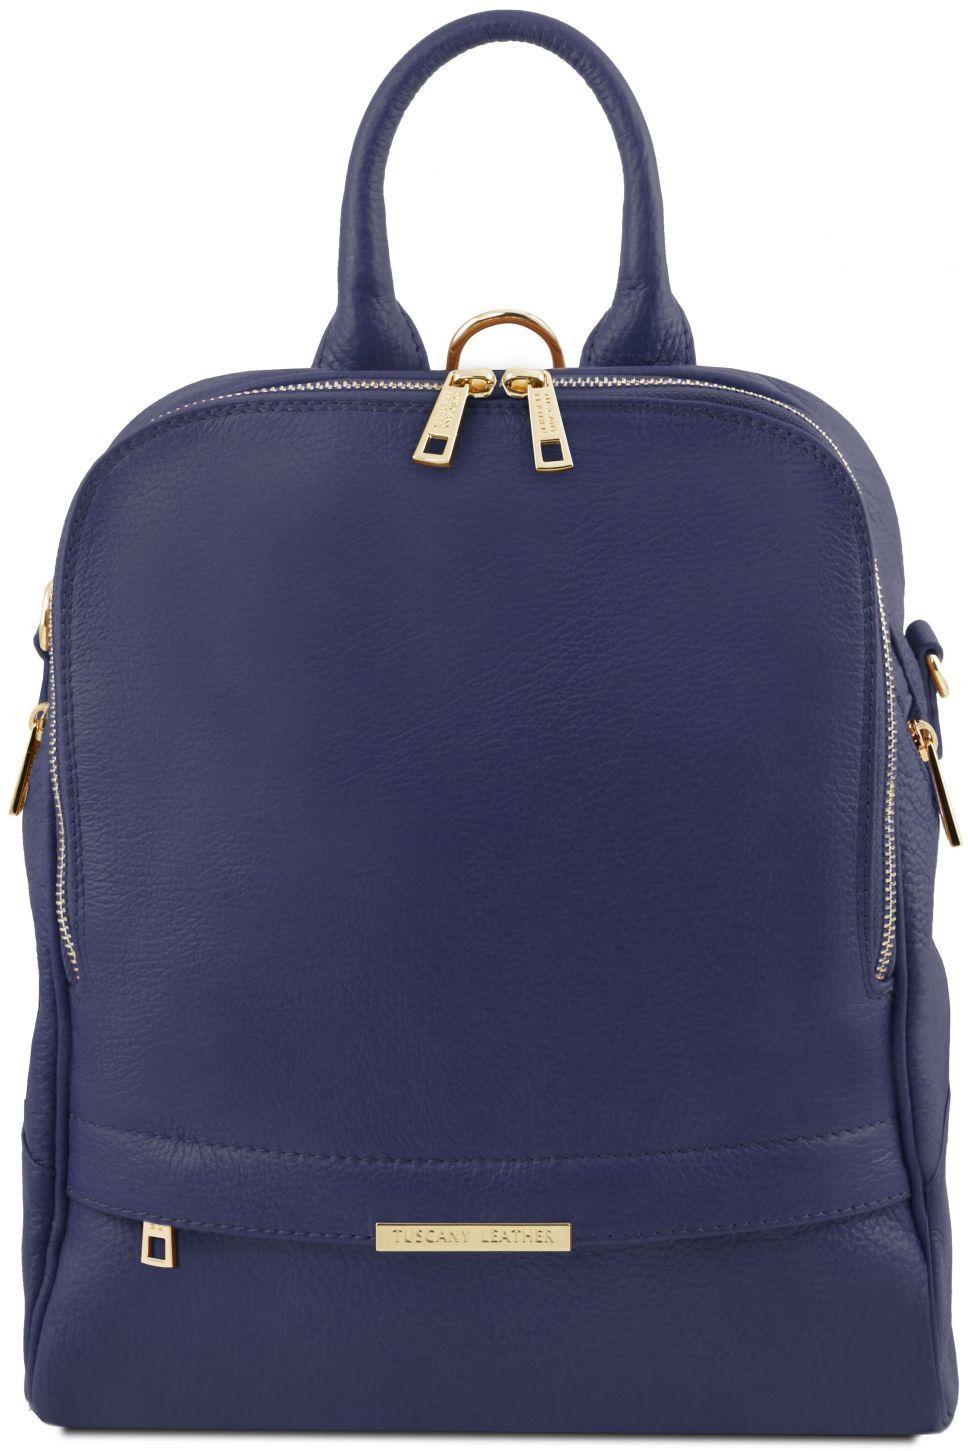 0d15efb818 Γυναικεία Τσάντα Πλάτης Δερμάτινη TL141376 Μπλε σκούρο Tuscany Leather ...